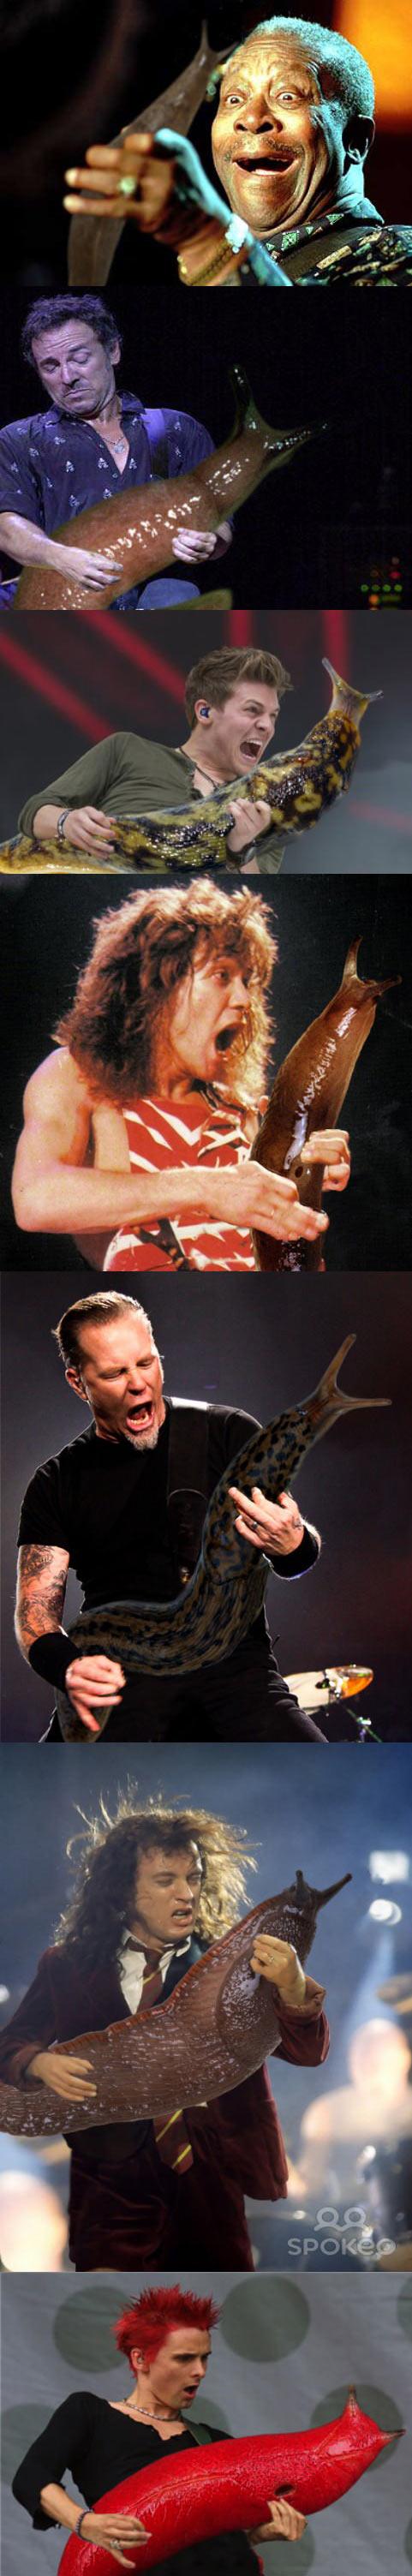 funny-guitar-players-holding-giant-slug-Metallica